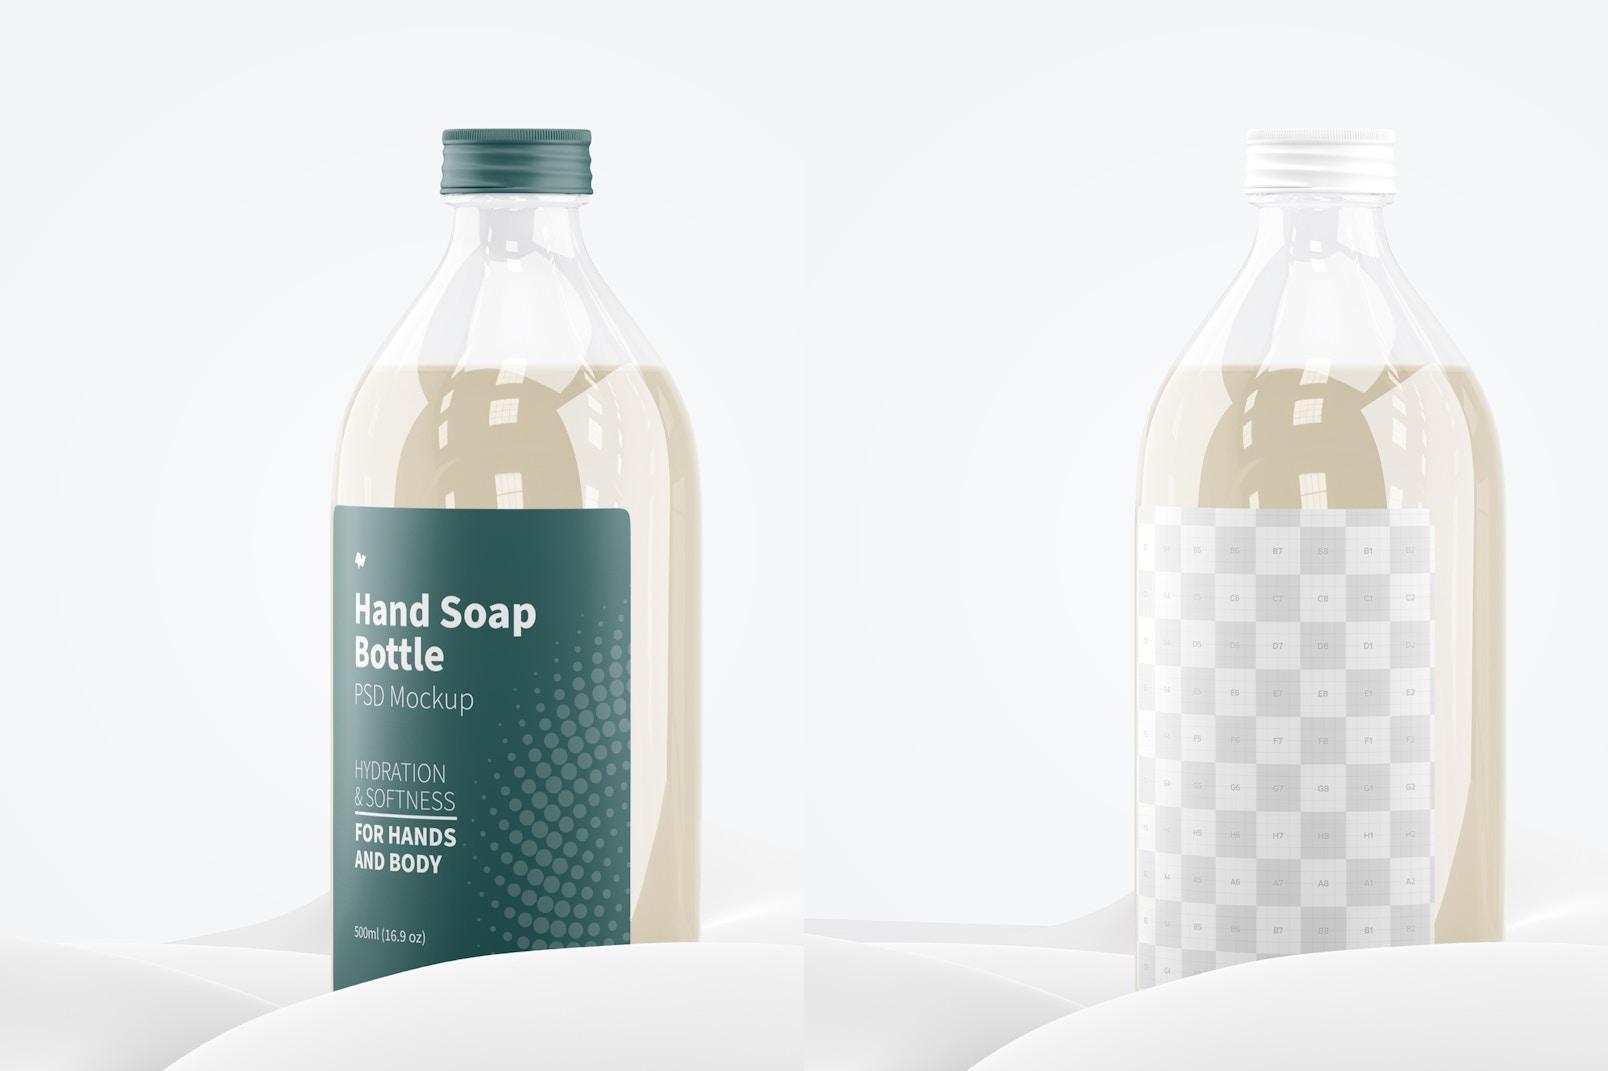 Hand Soap Clear Bottle Mockup